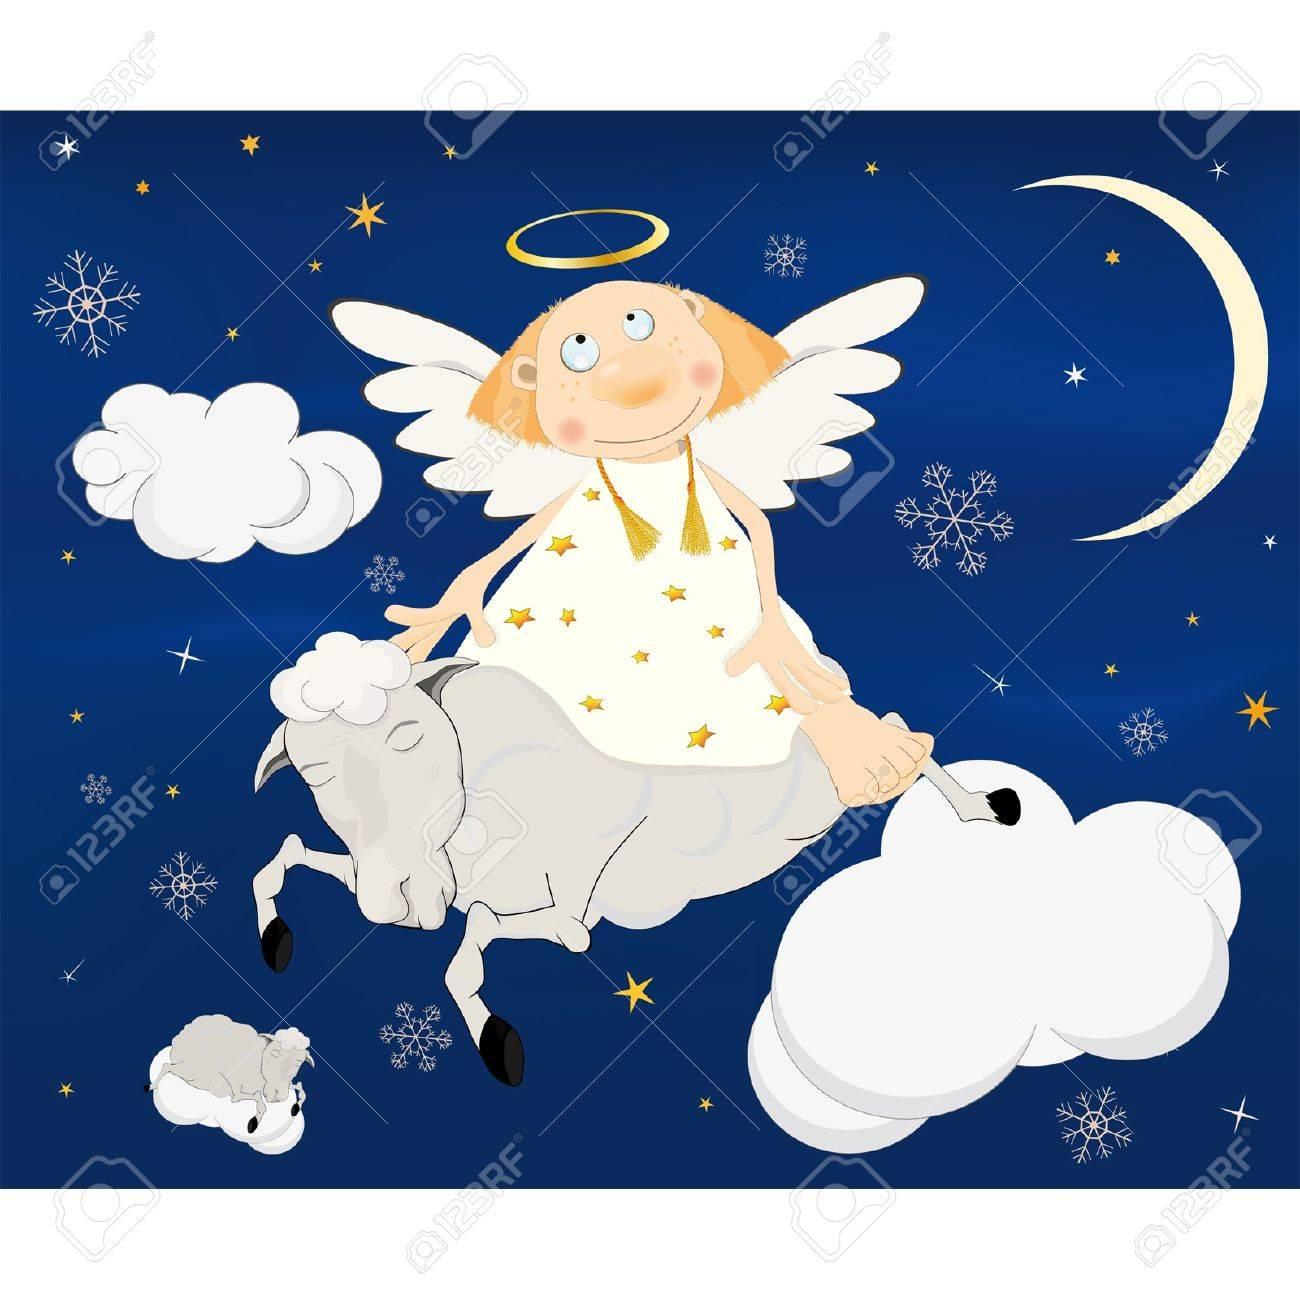 Christmas card.Angel on a lamb. Stock Vector - 12487559